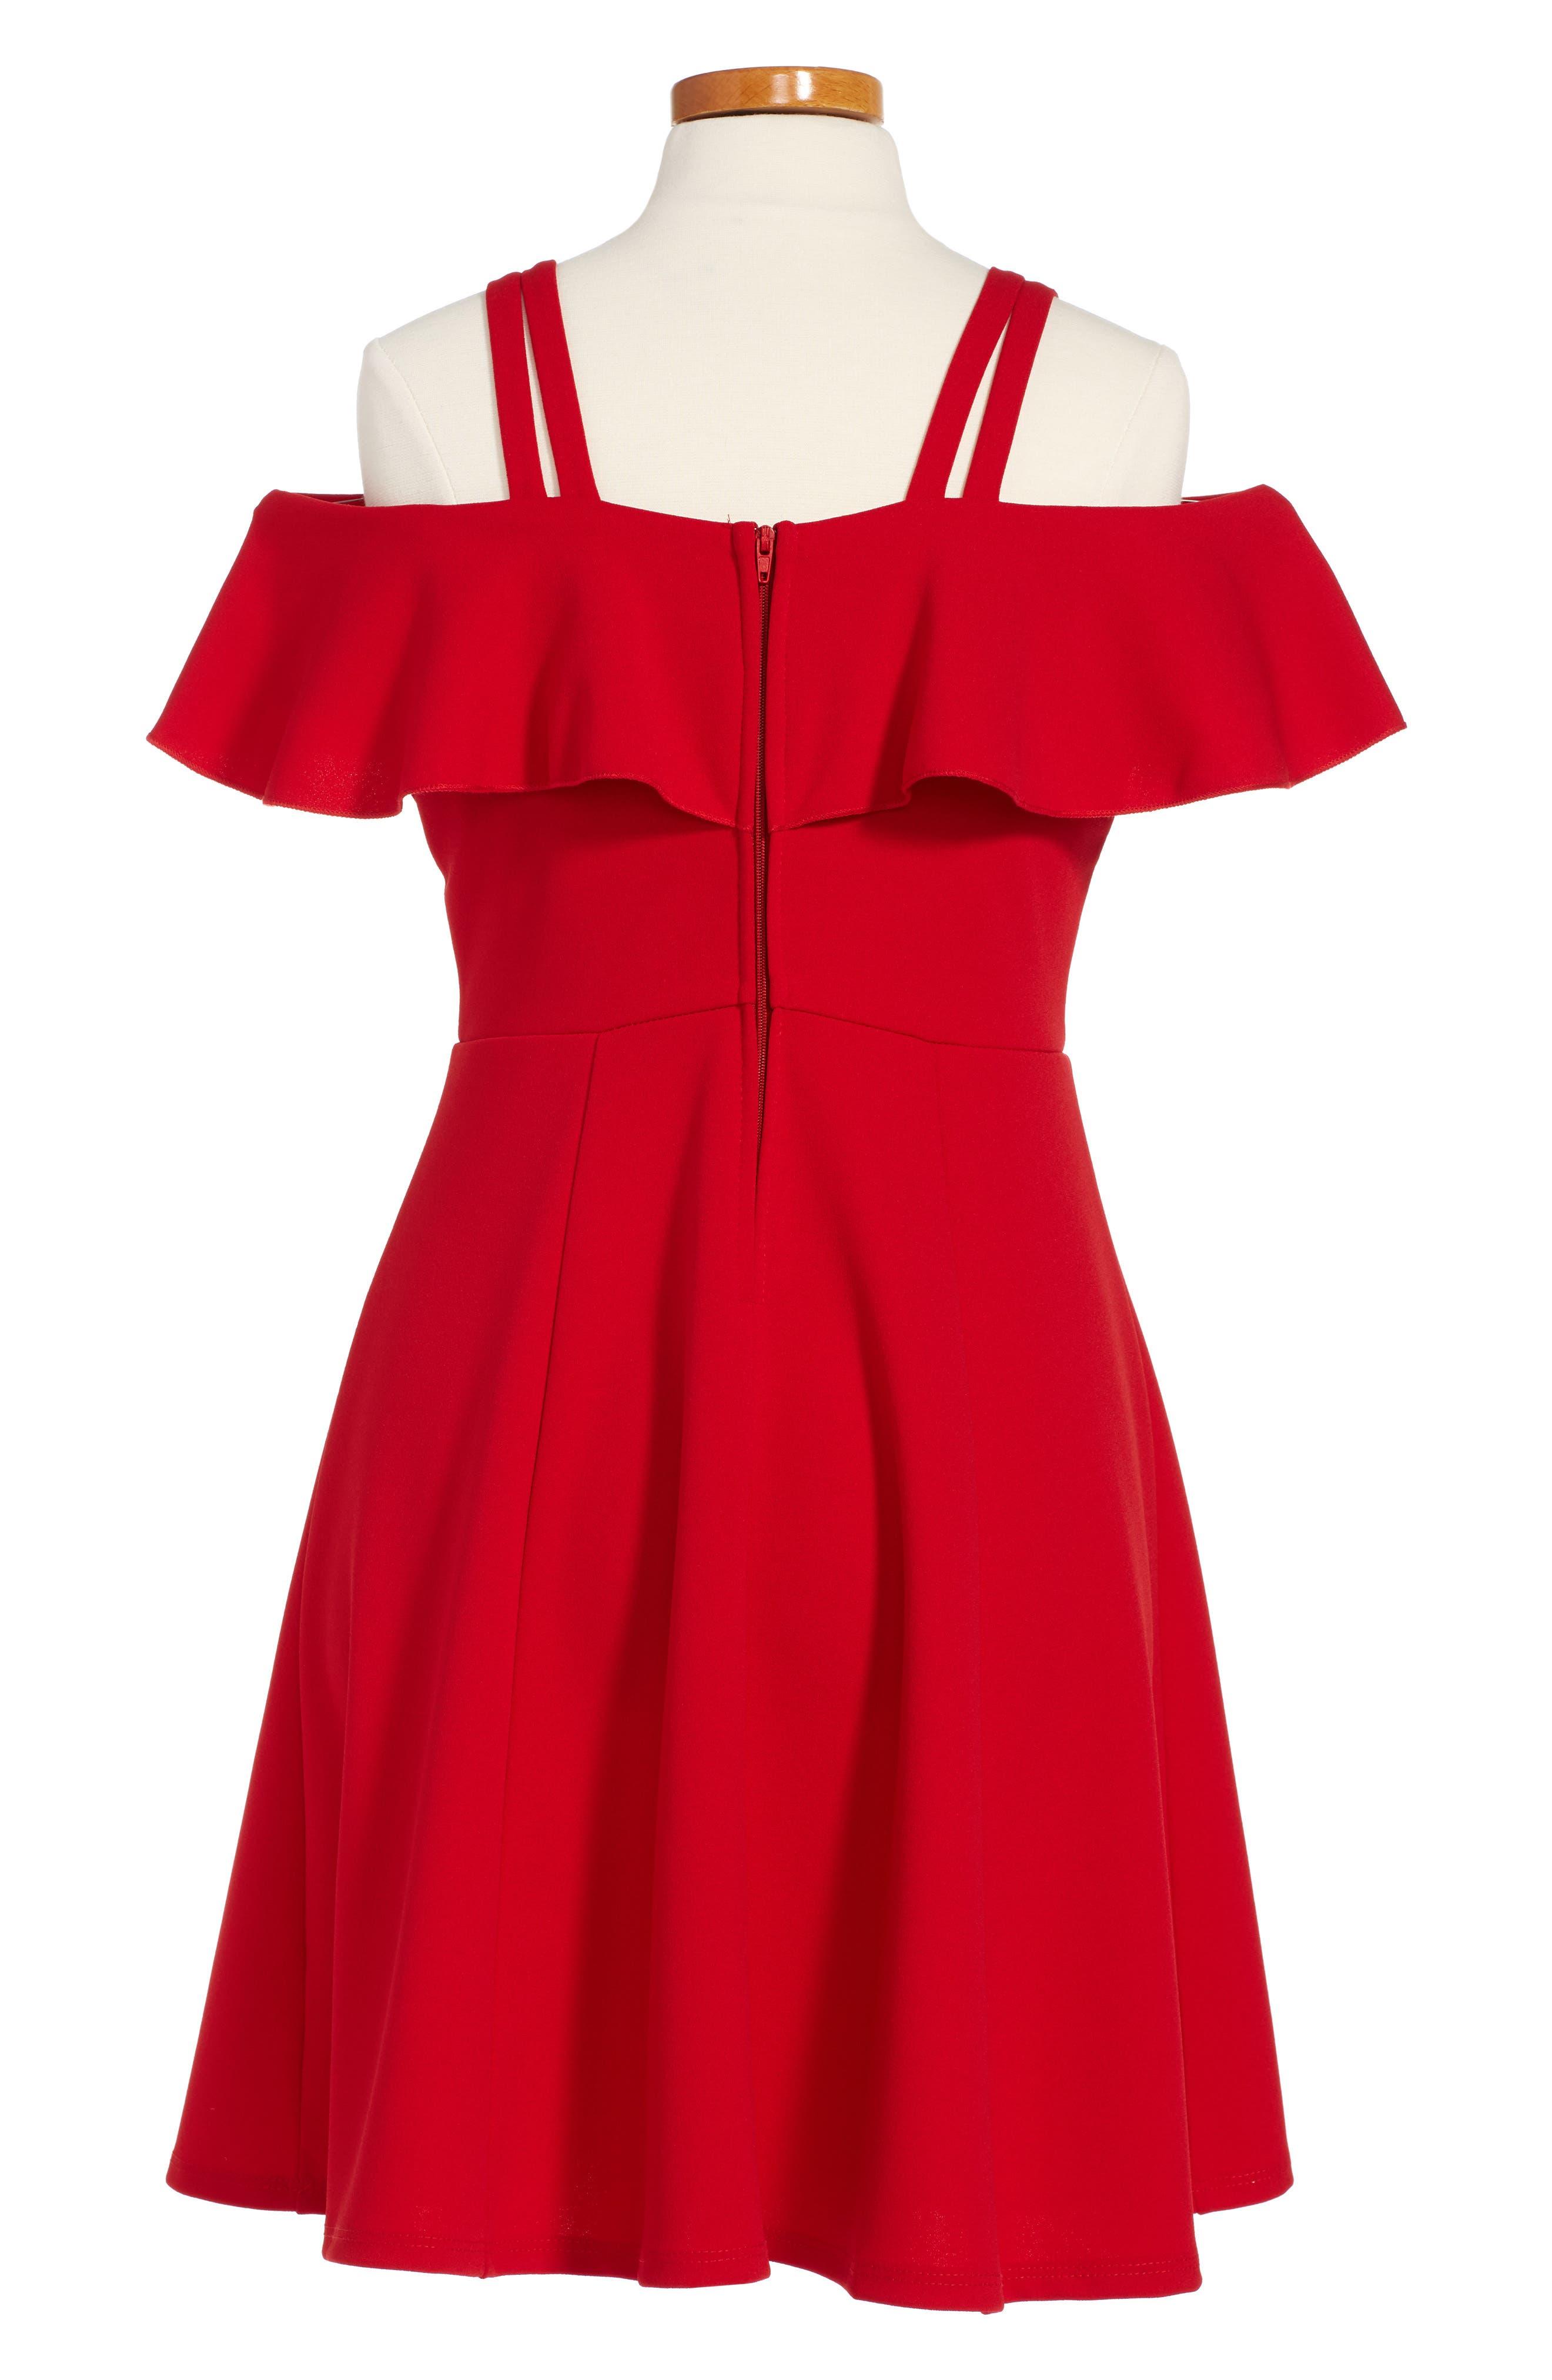 Alternate Image 2  - Love, Nickie Lew Off the Shoulder Ruffle Dress (Big Girls)